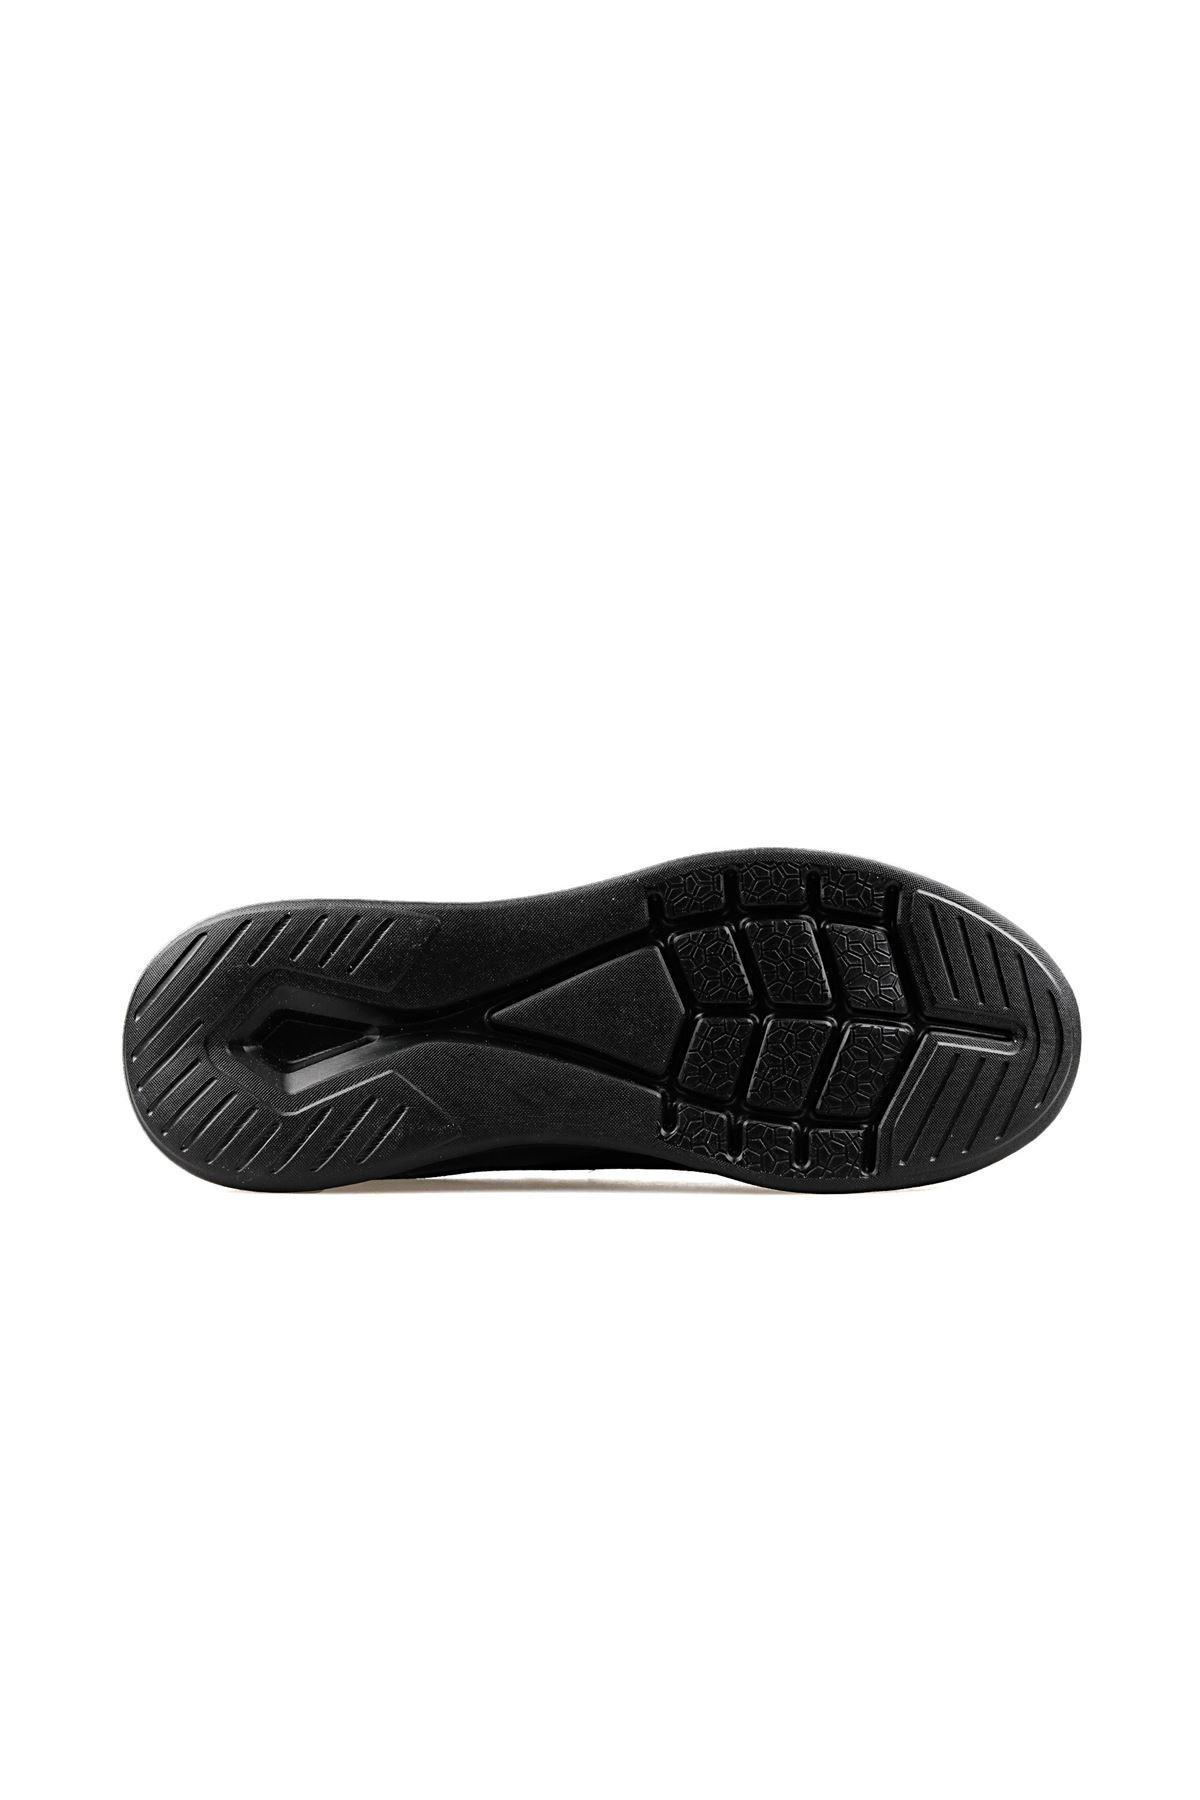 Jump Fileli Rahat Erkek Spor Ayakkabı SİYAH 24784